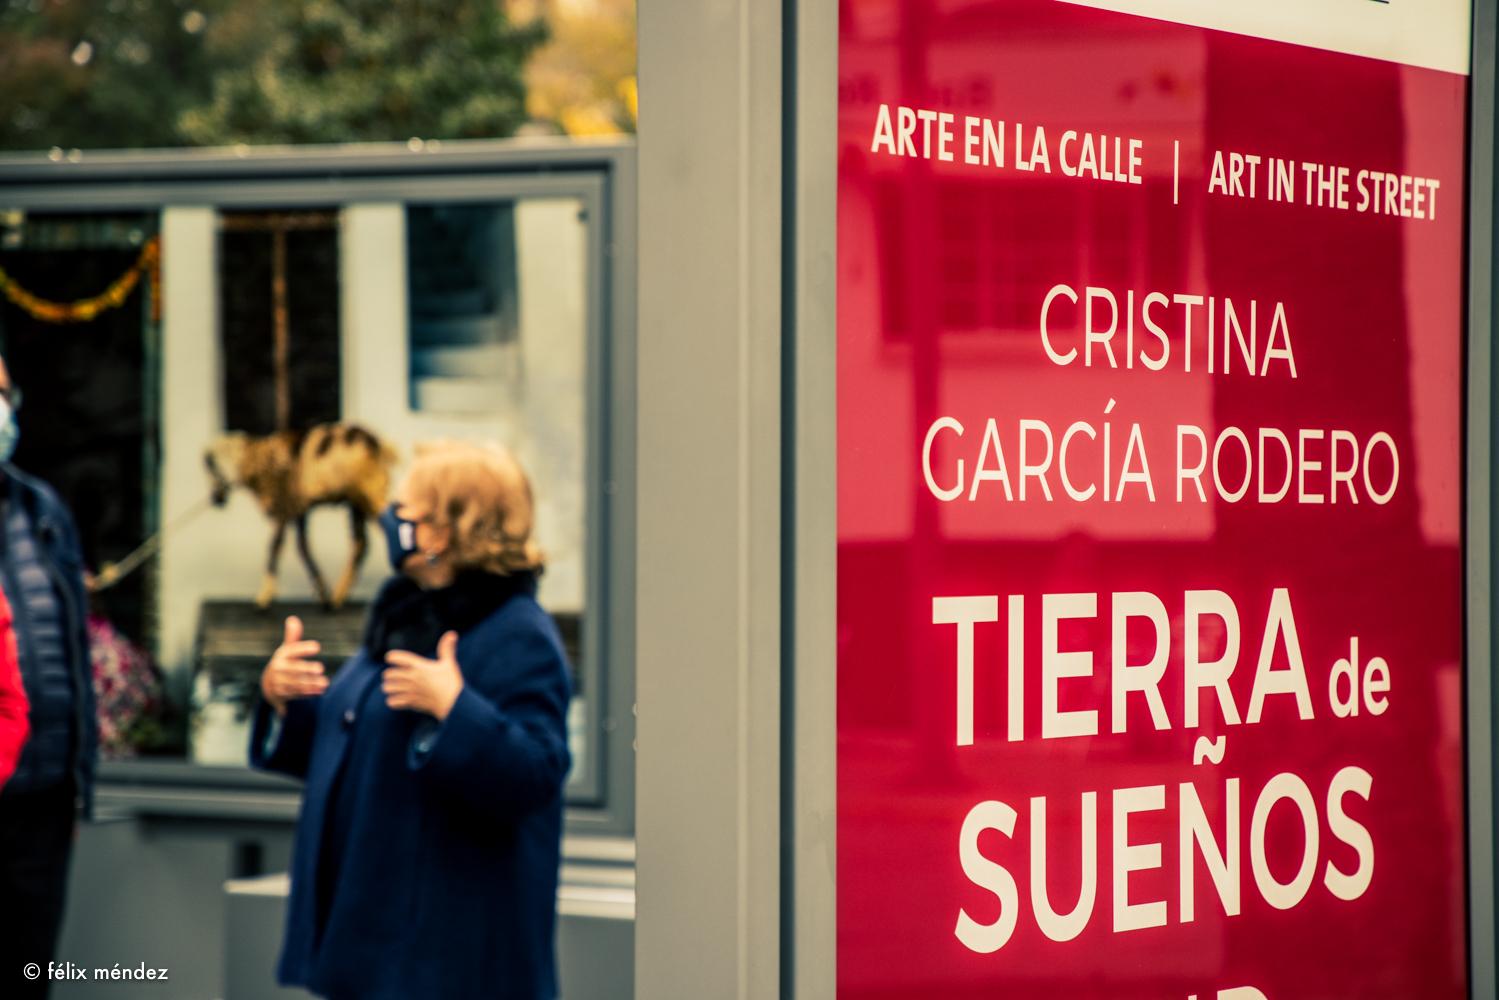 Cristina-Garcia-Rodero-cultura-overdose-badajoz-012